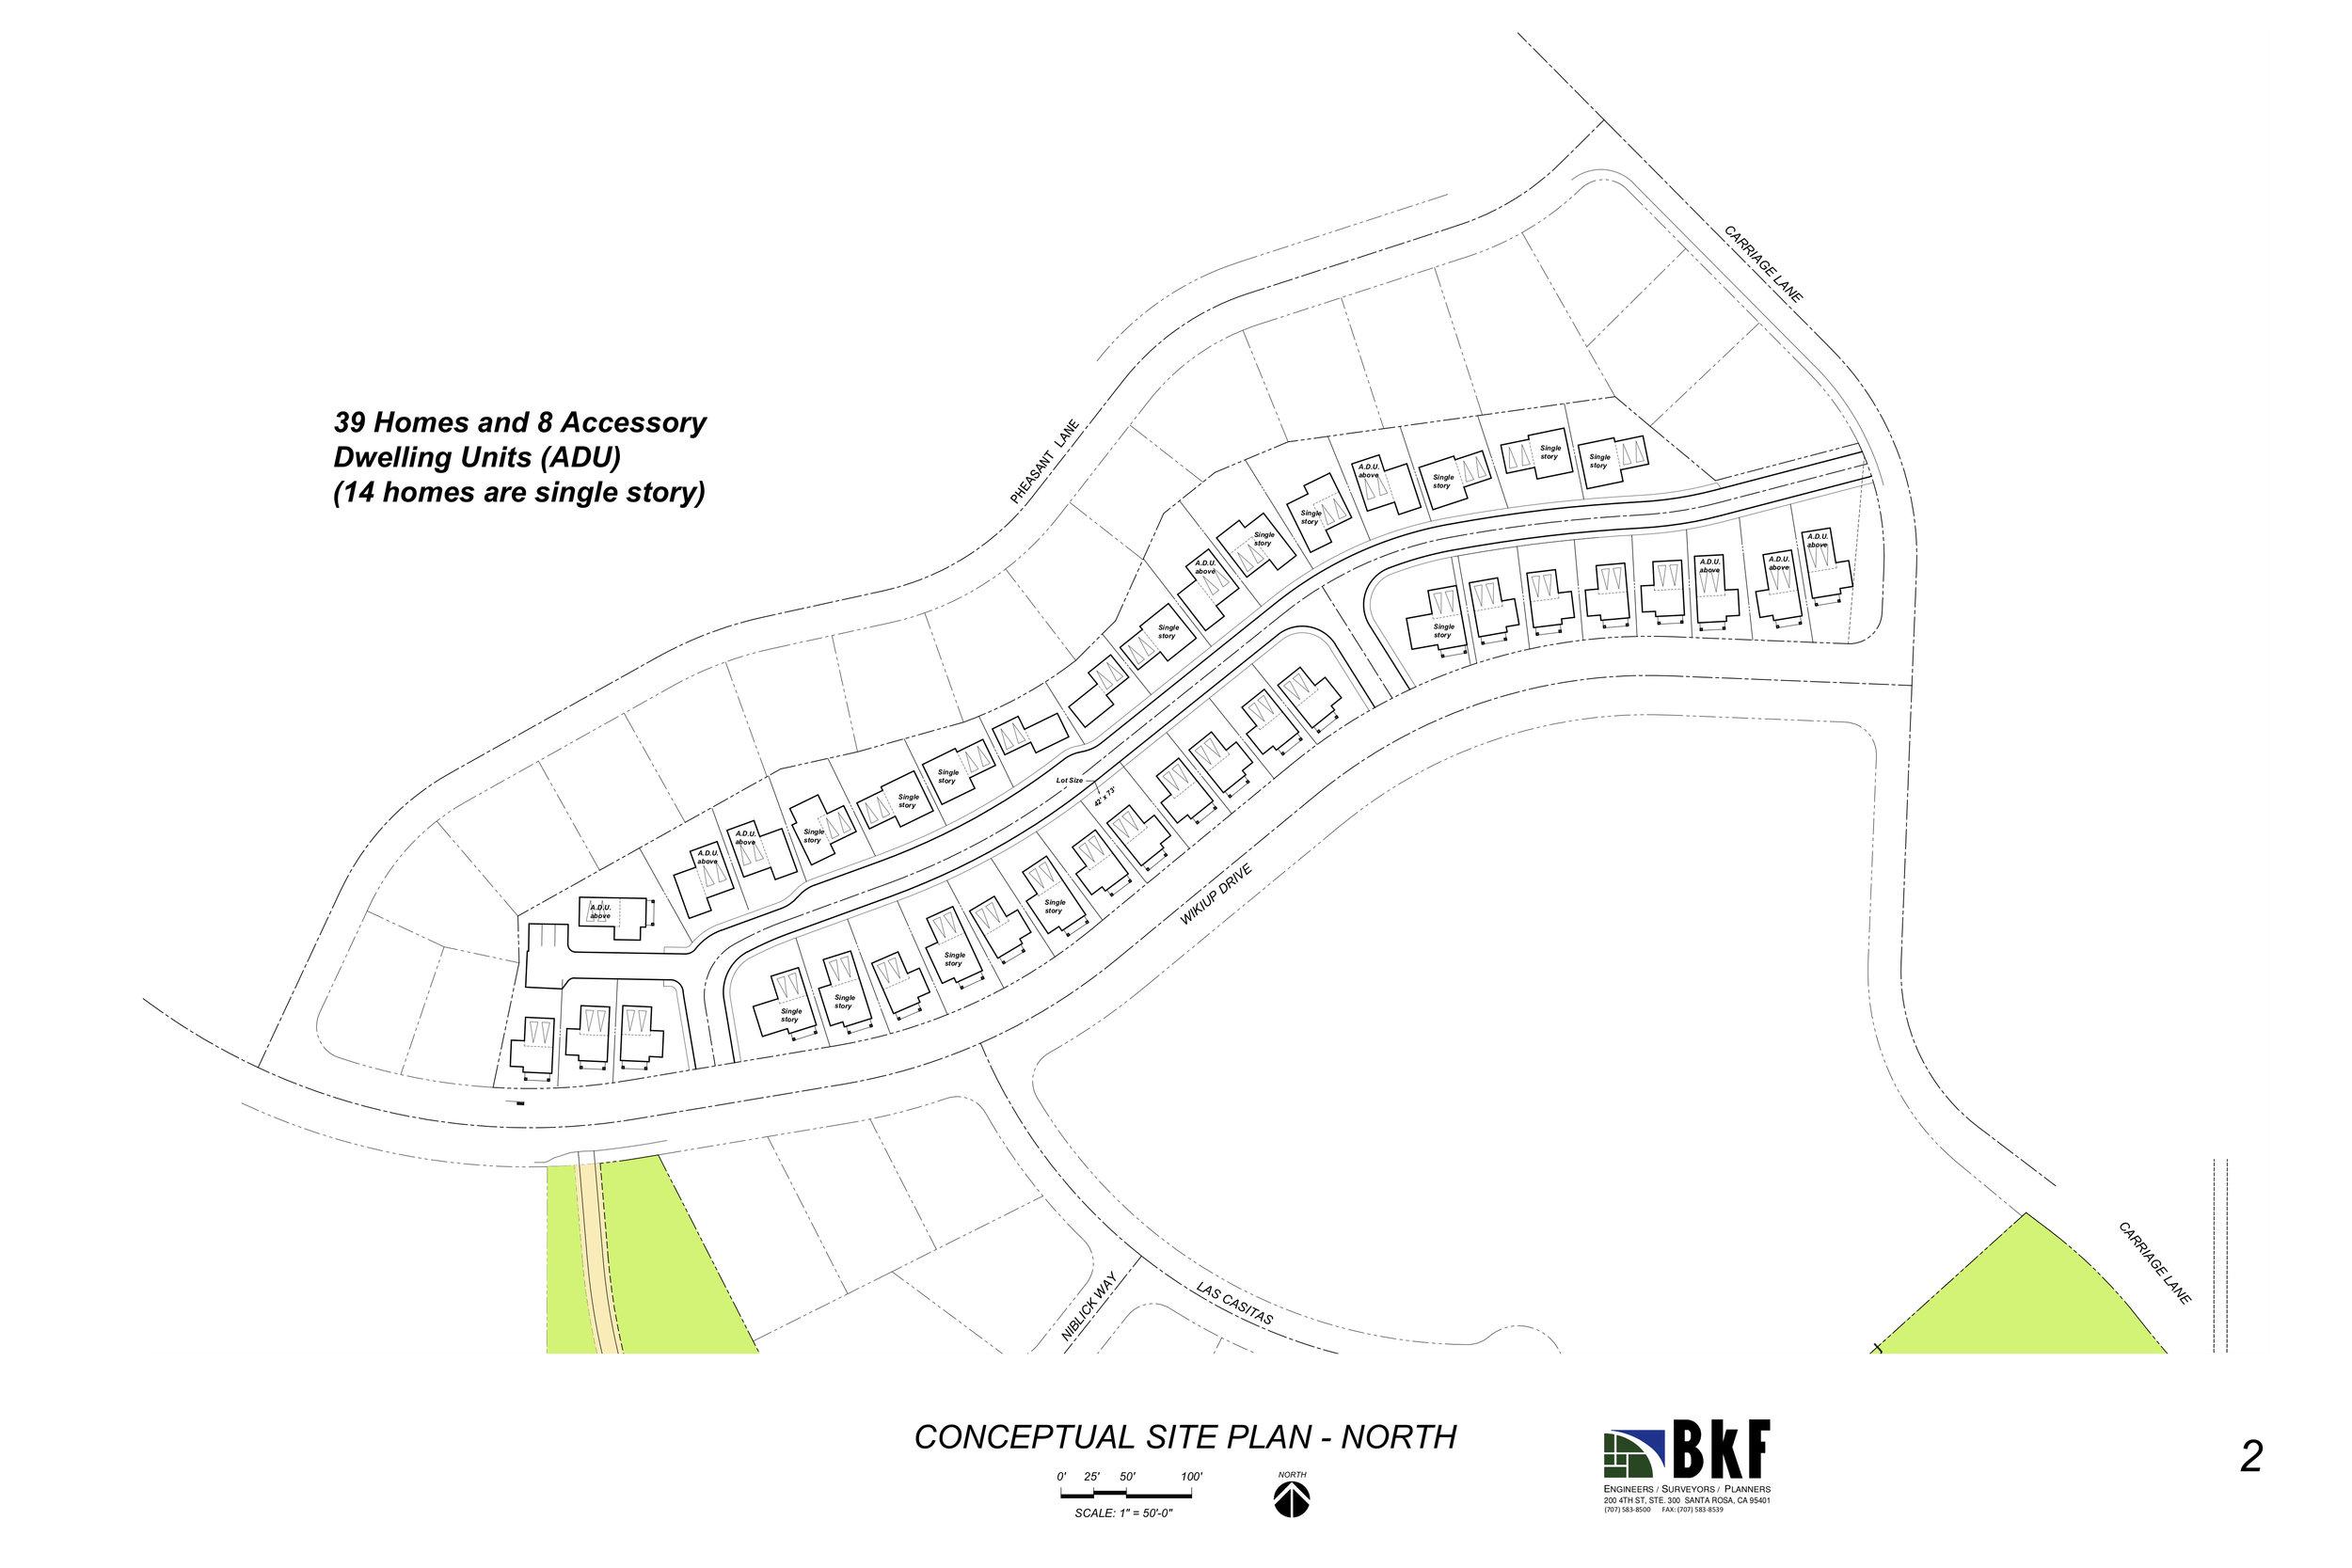 1809-Site Plan 7-SITE PLAN - NORTH.jpg